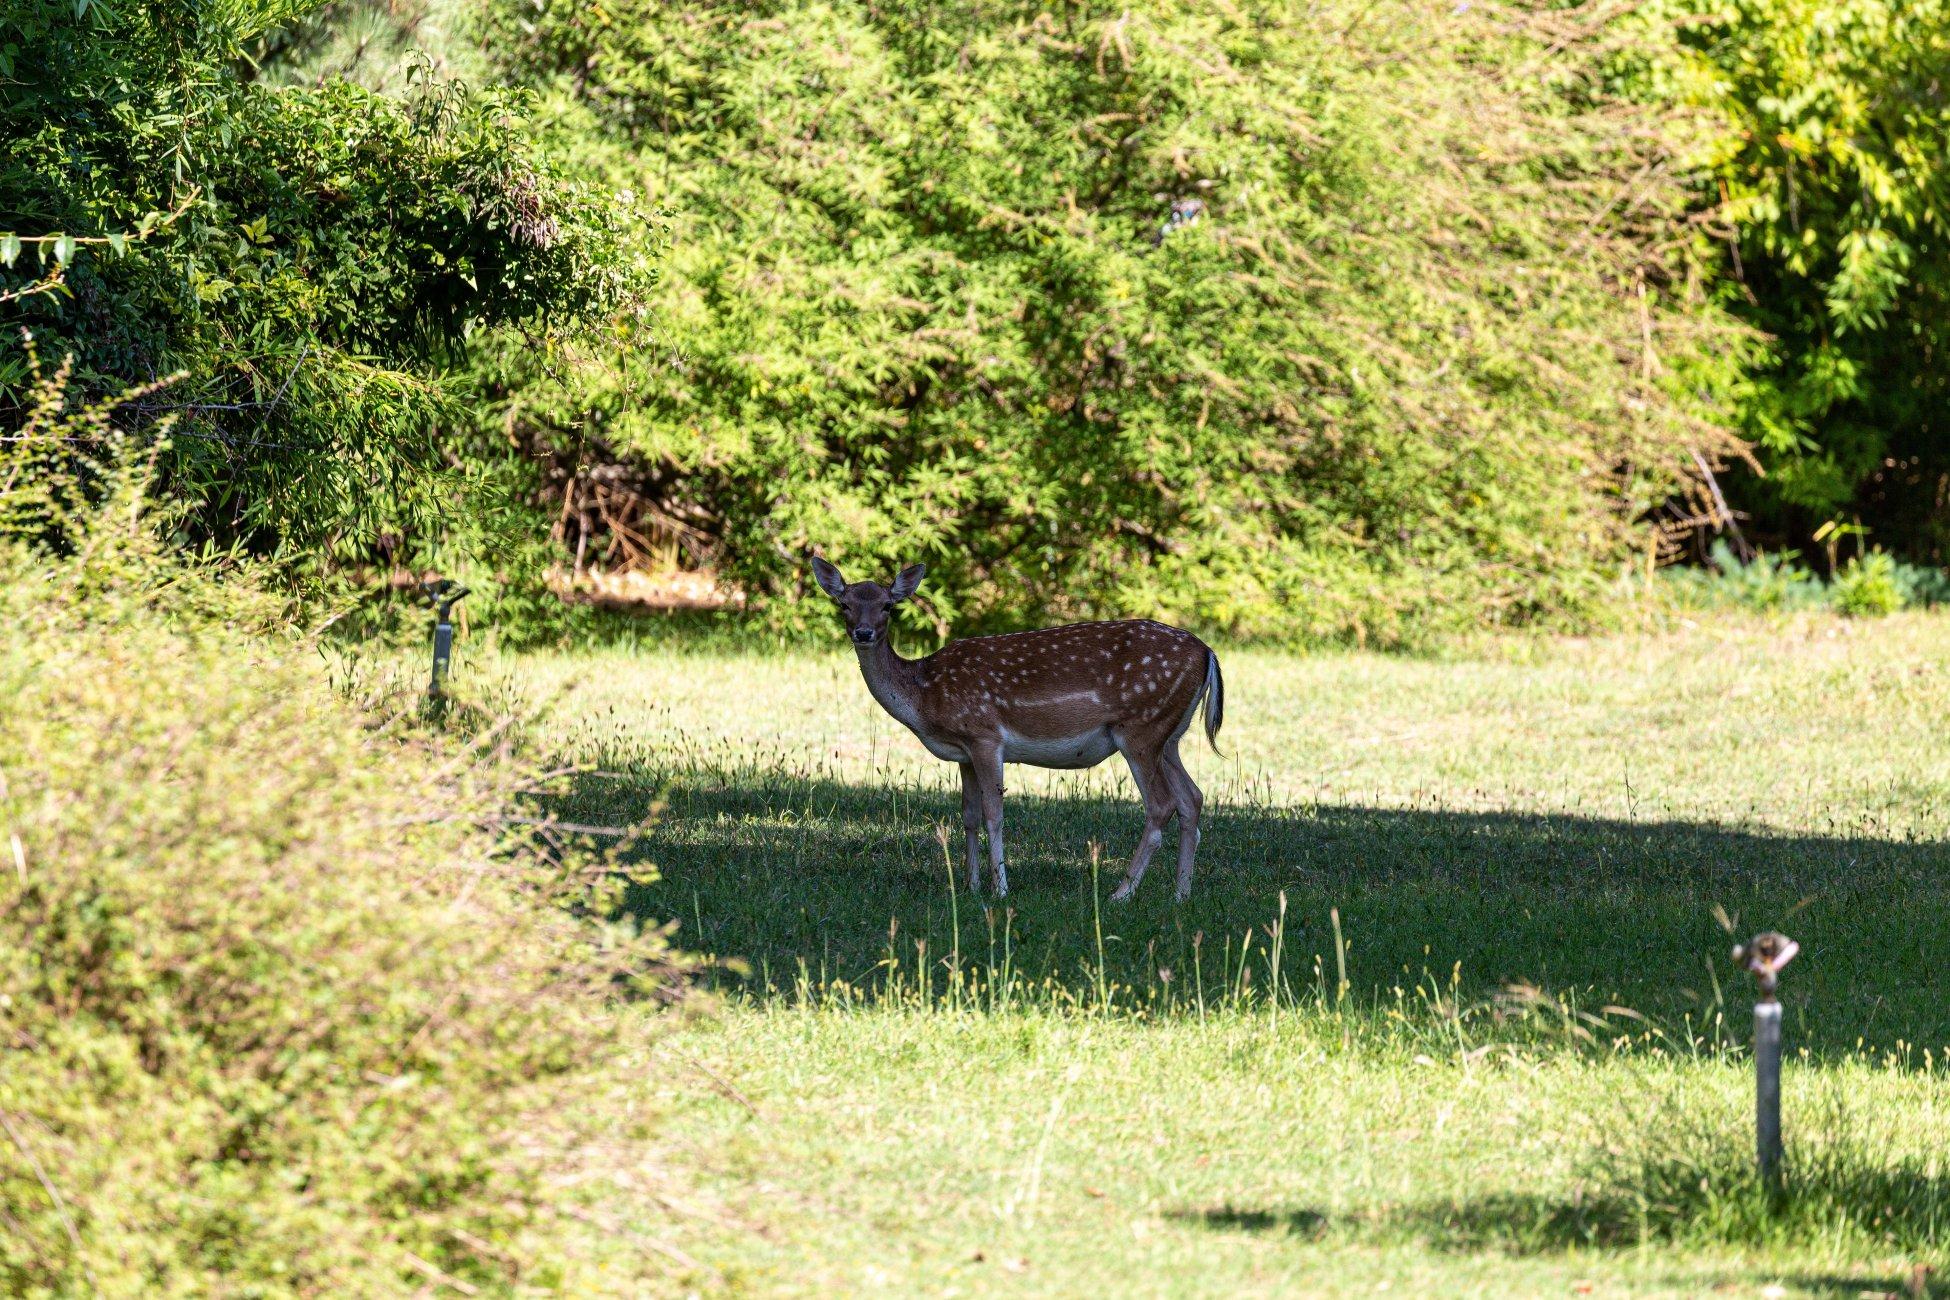 European fallow deer on a field in the forest